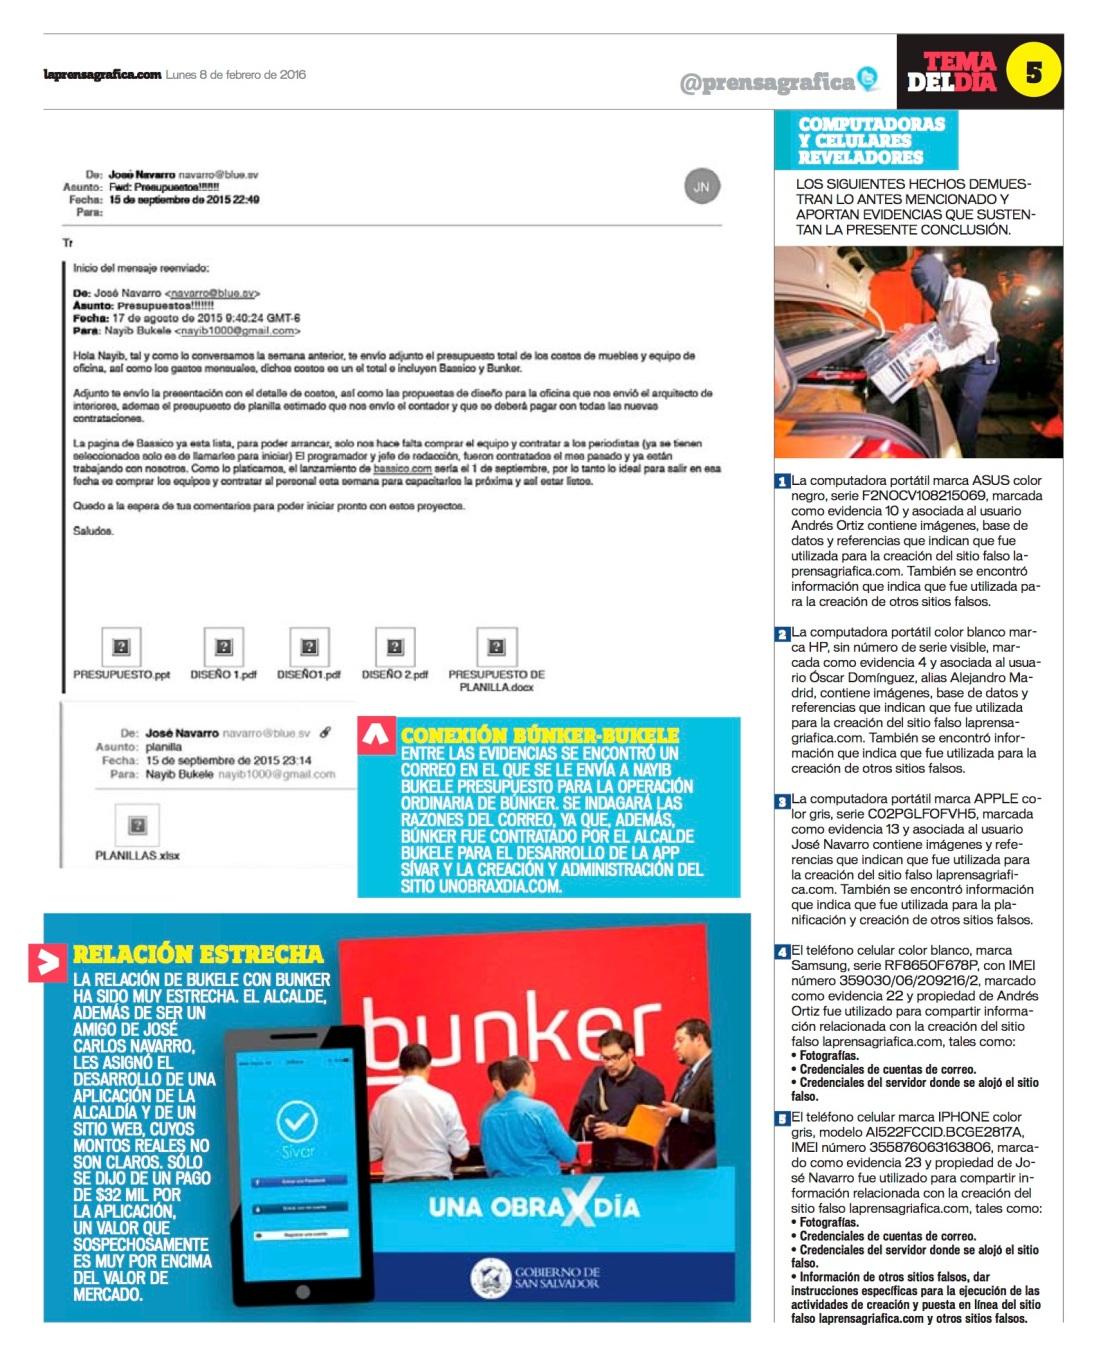 LPG20160208 - La Prensa Gráfica - PORTADA - pag 17